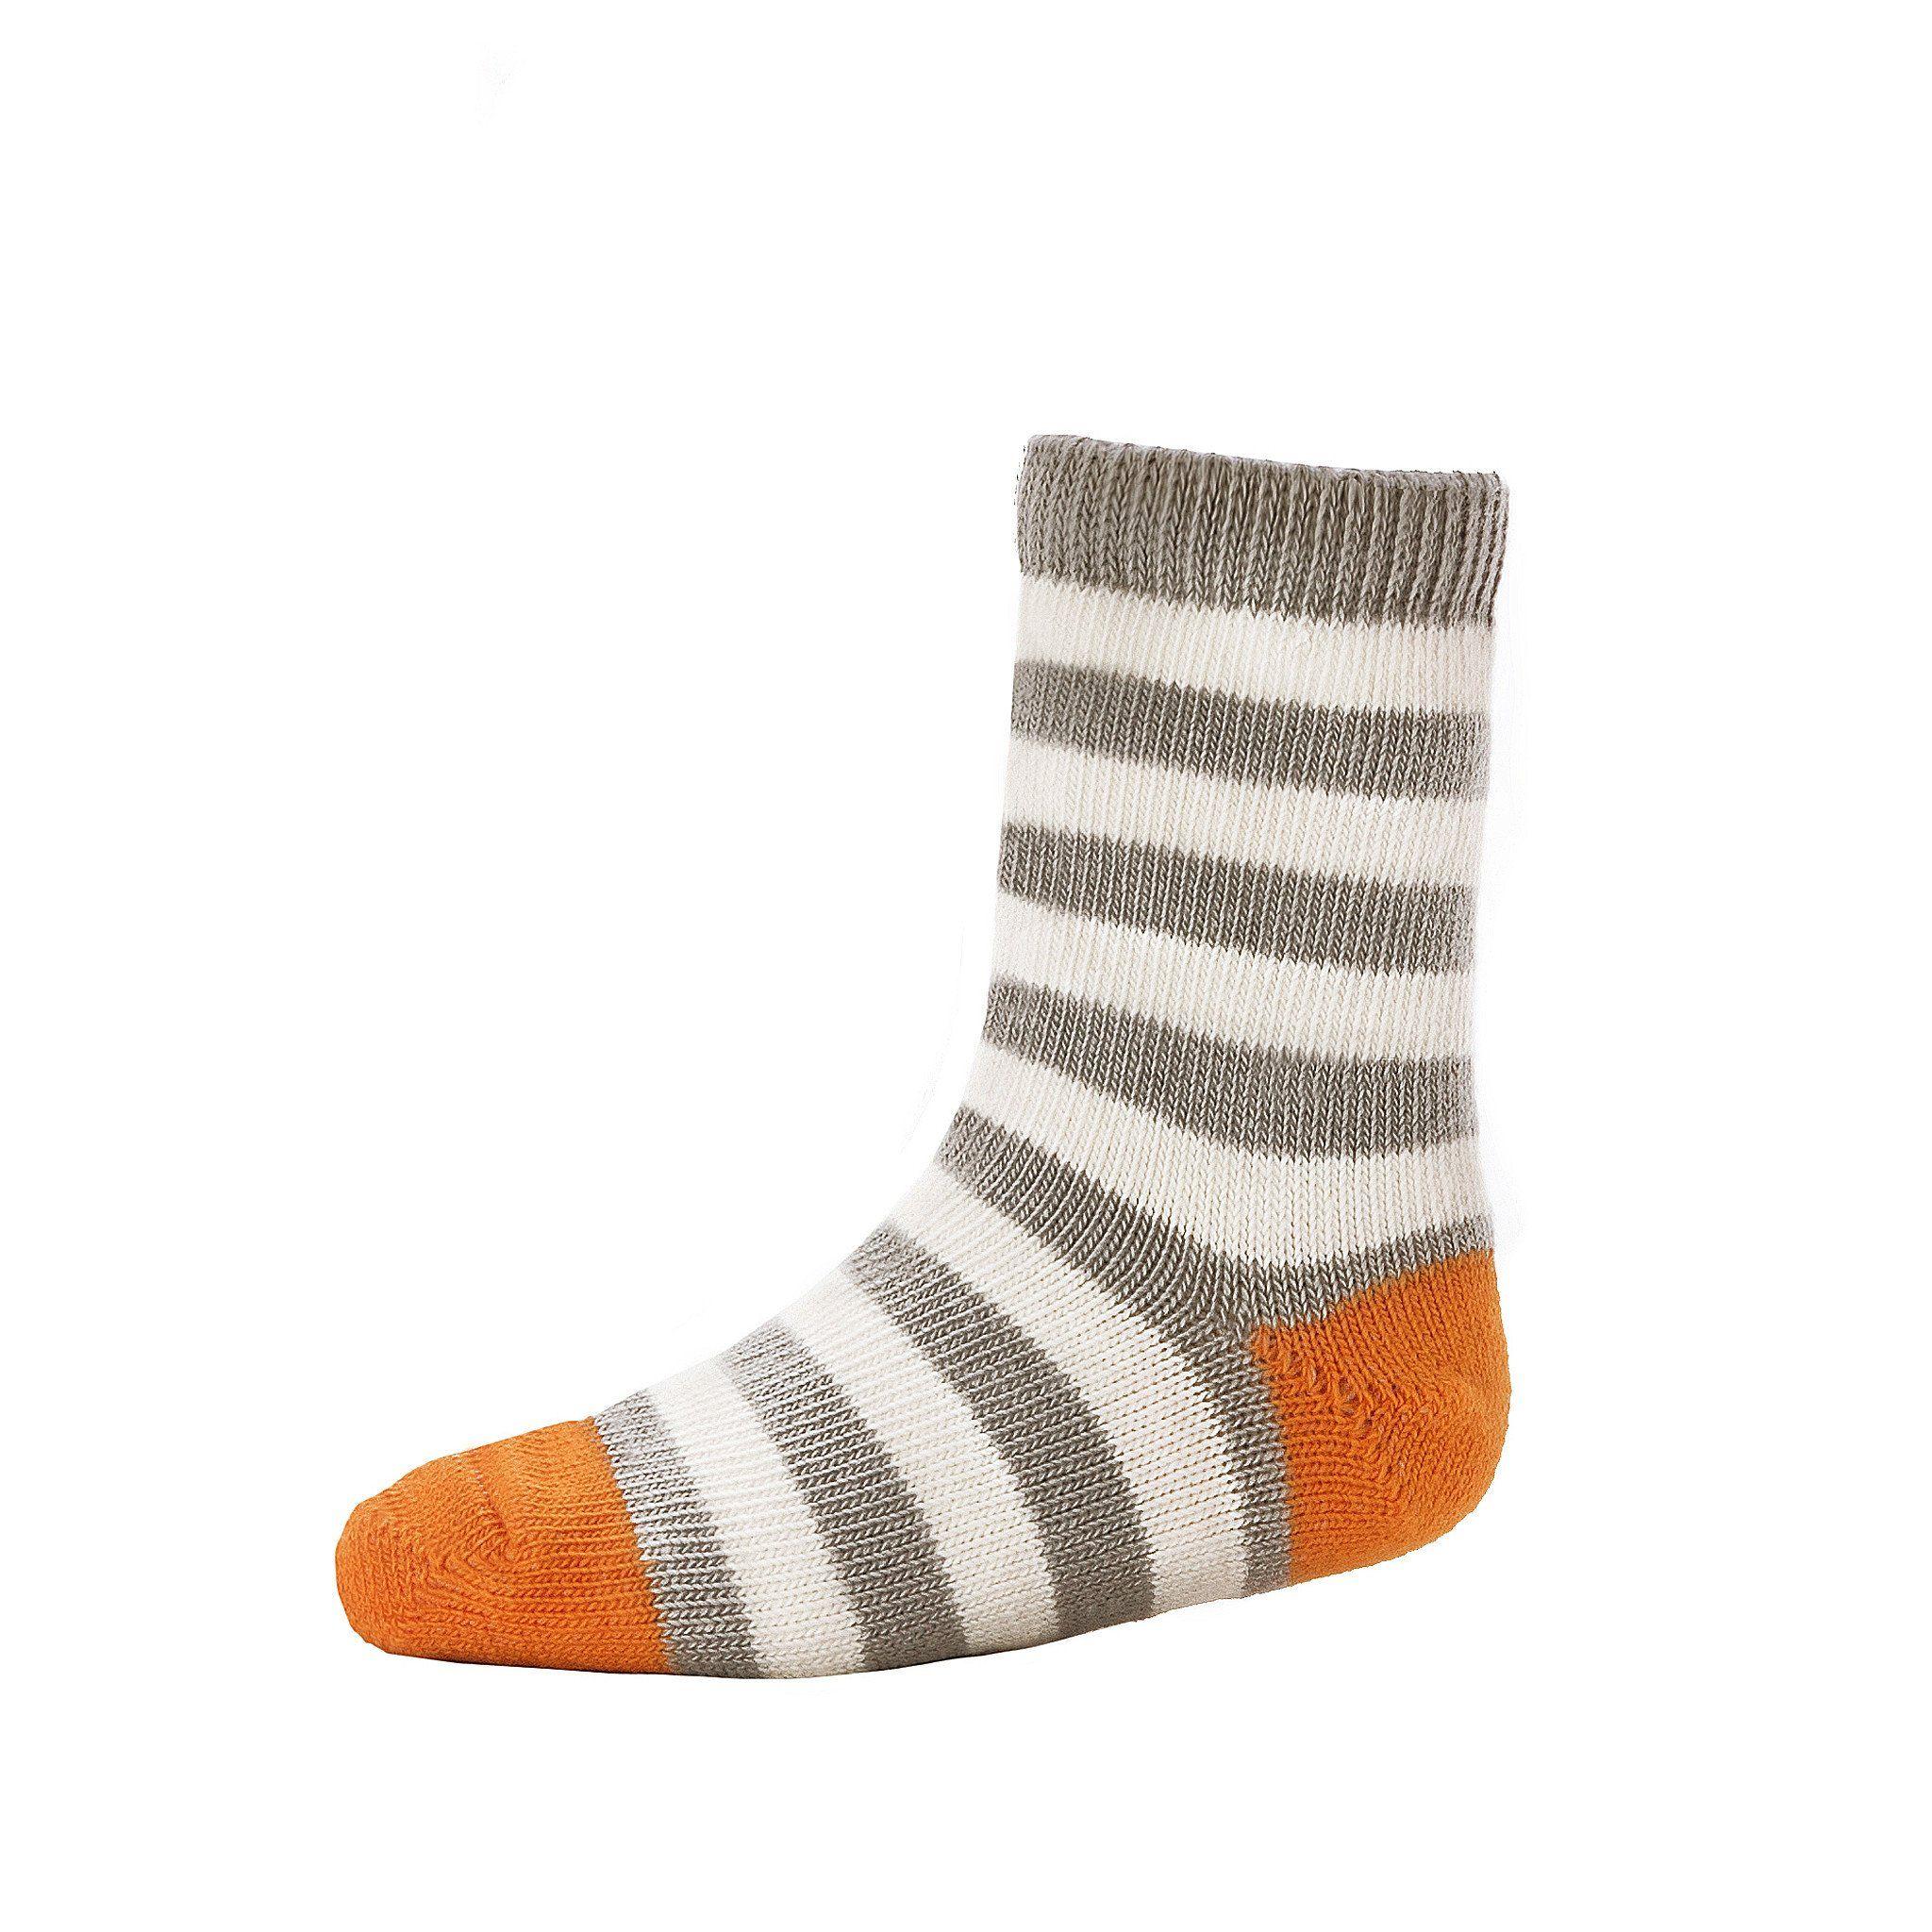 Kids Crew Sock Striped Grey Natural Organic Cotton Toddler Socks Kids Crew Socks